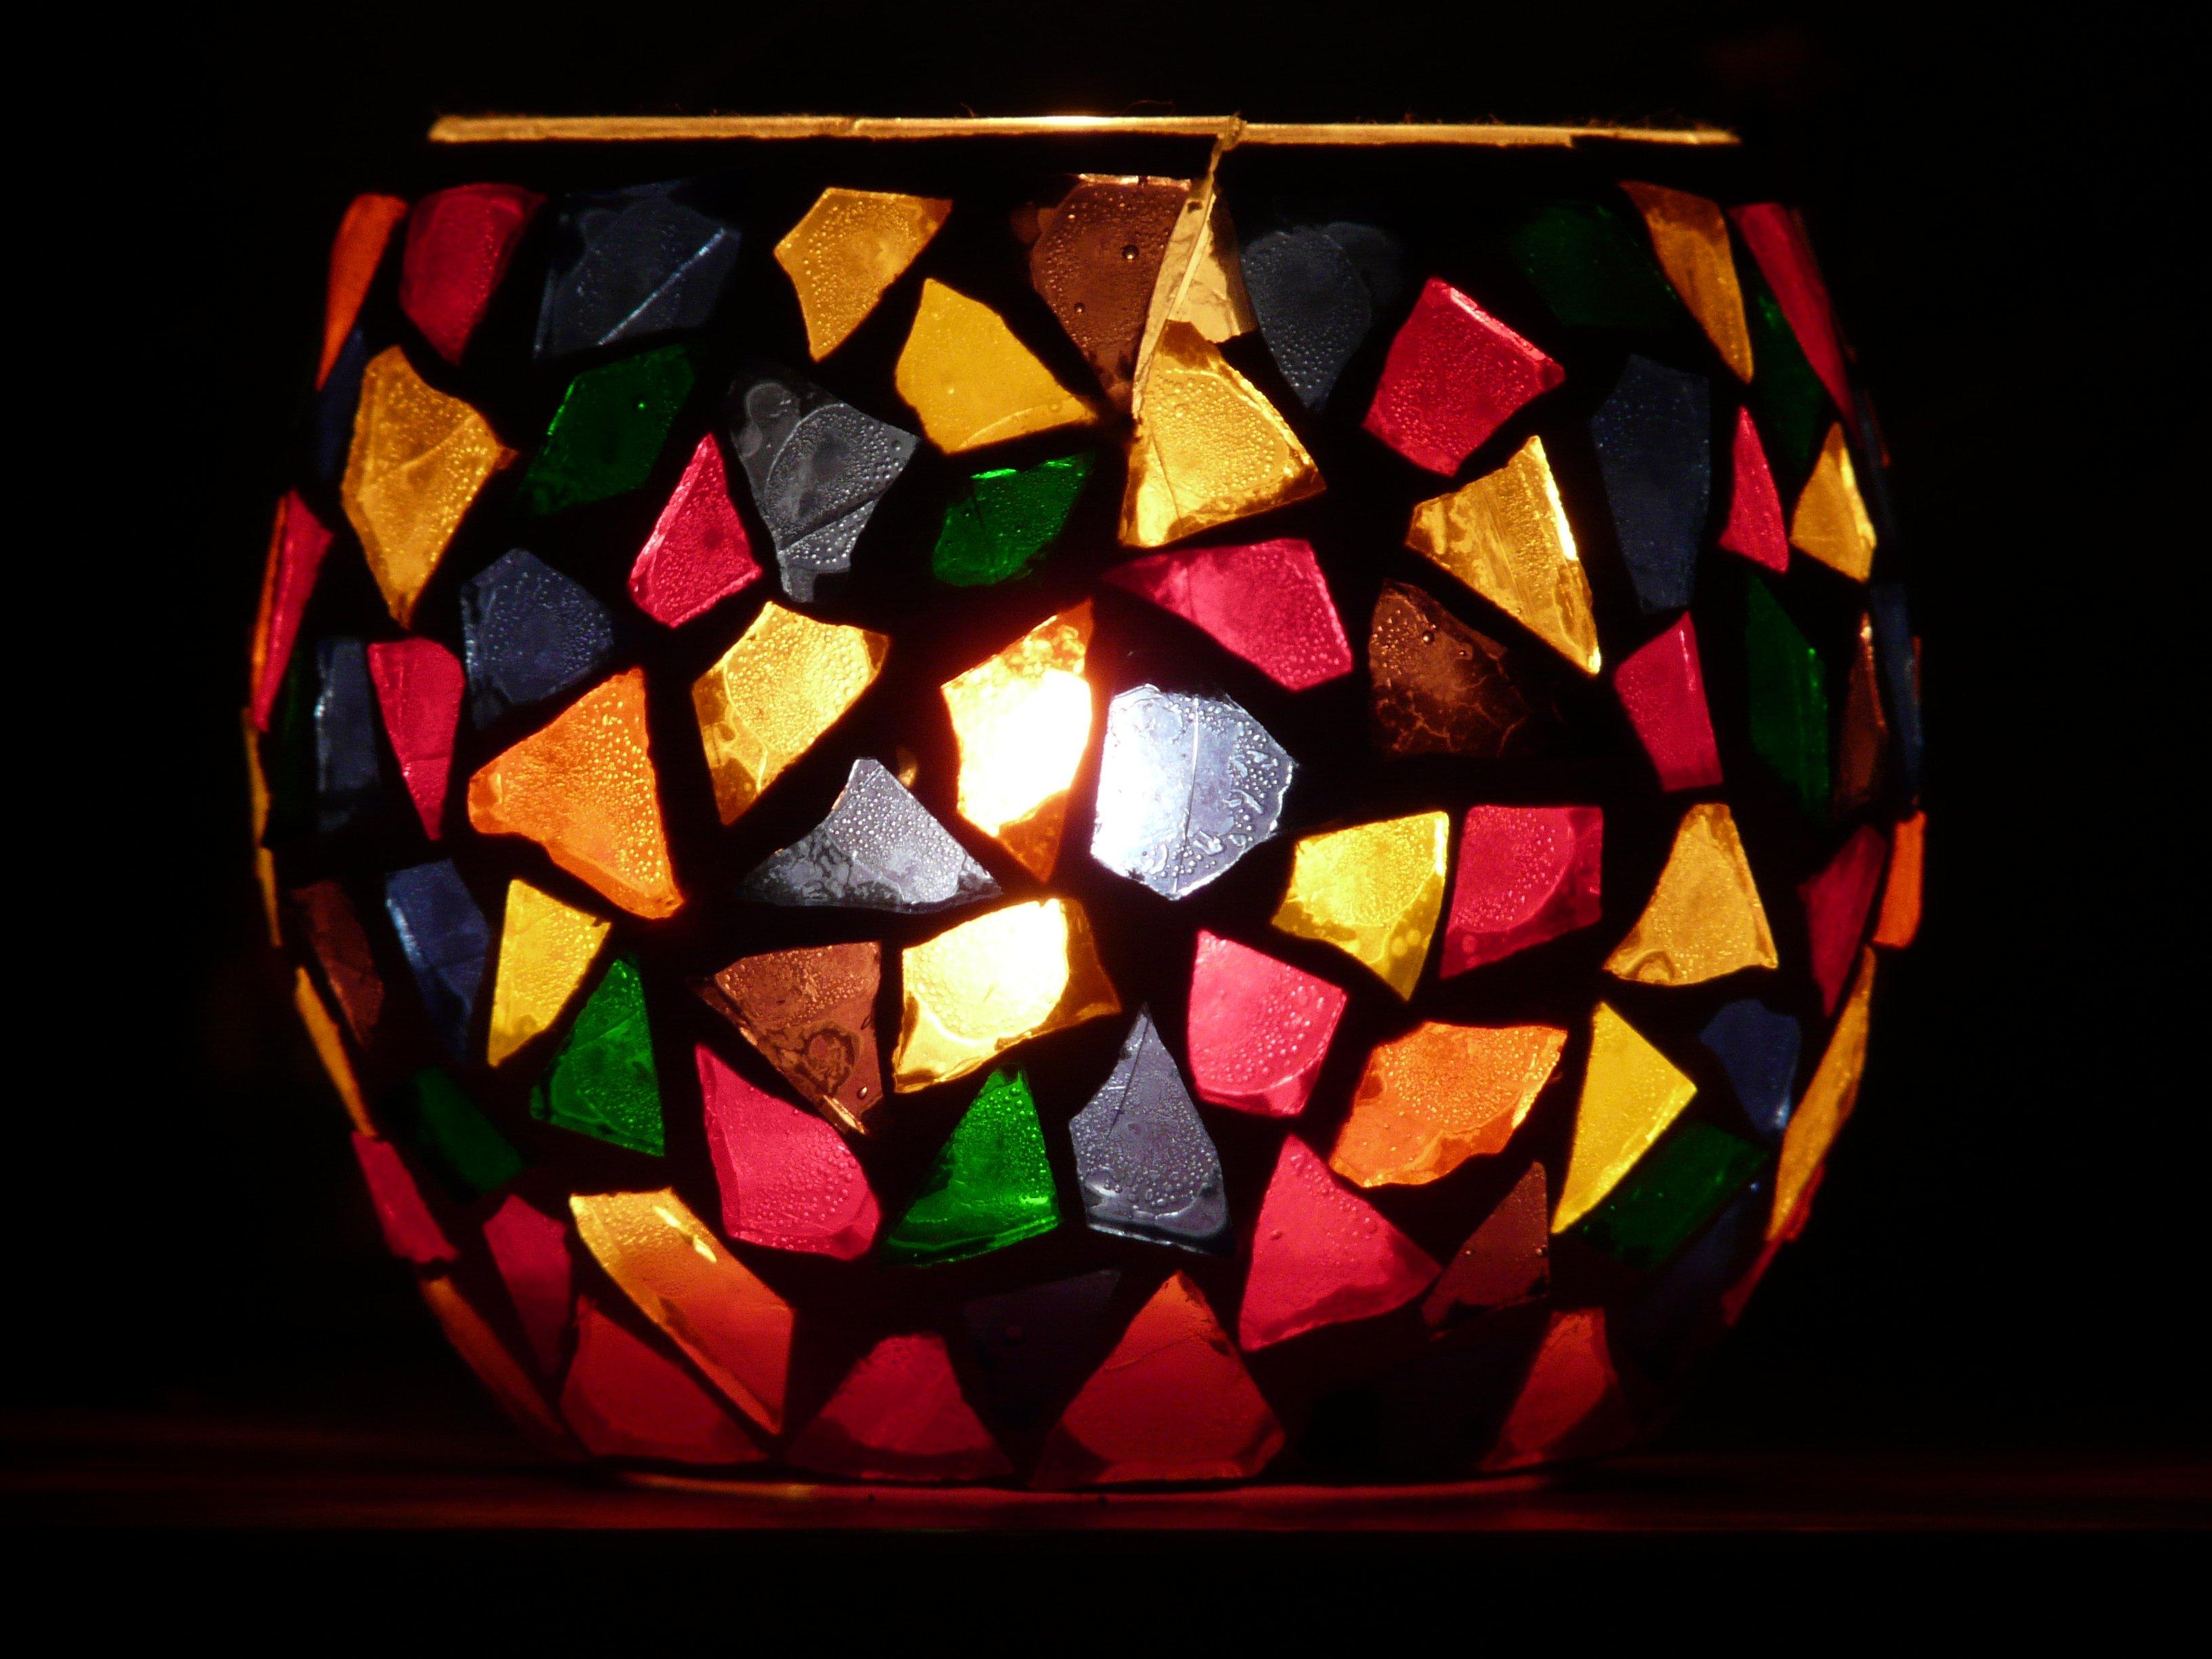 free images light window evening color colorful. Black Bedroom Furniture Sets. Home Design Ideas